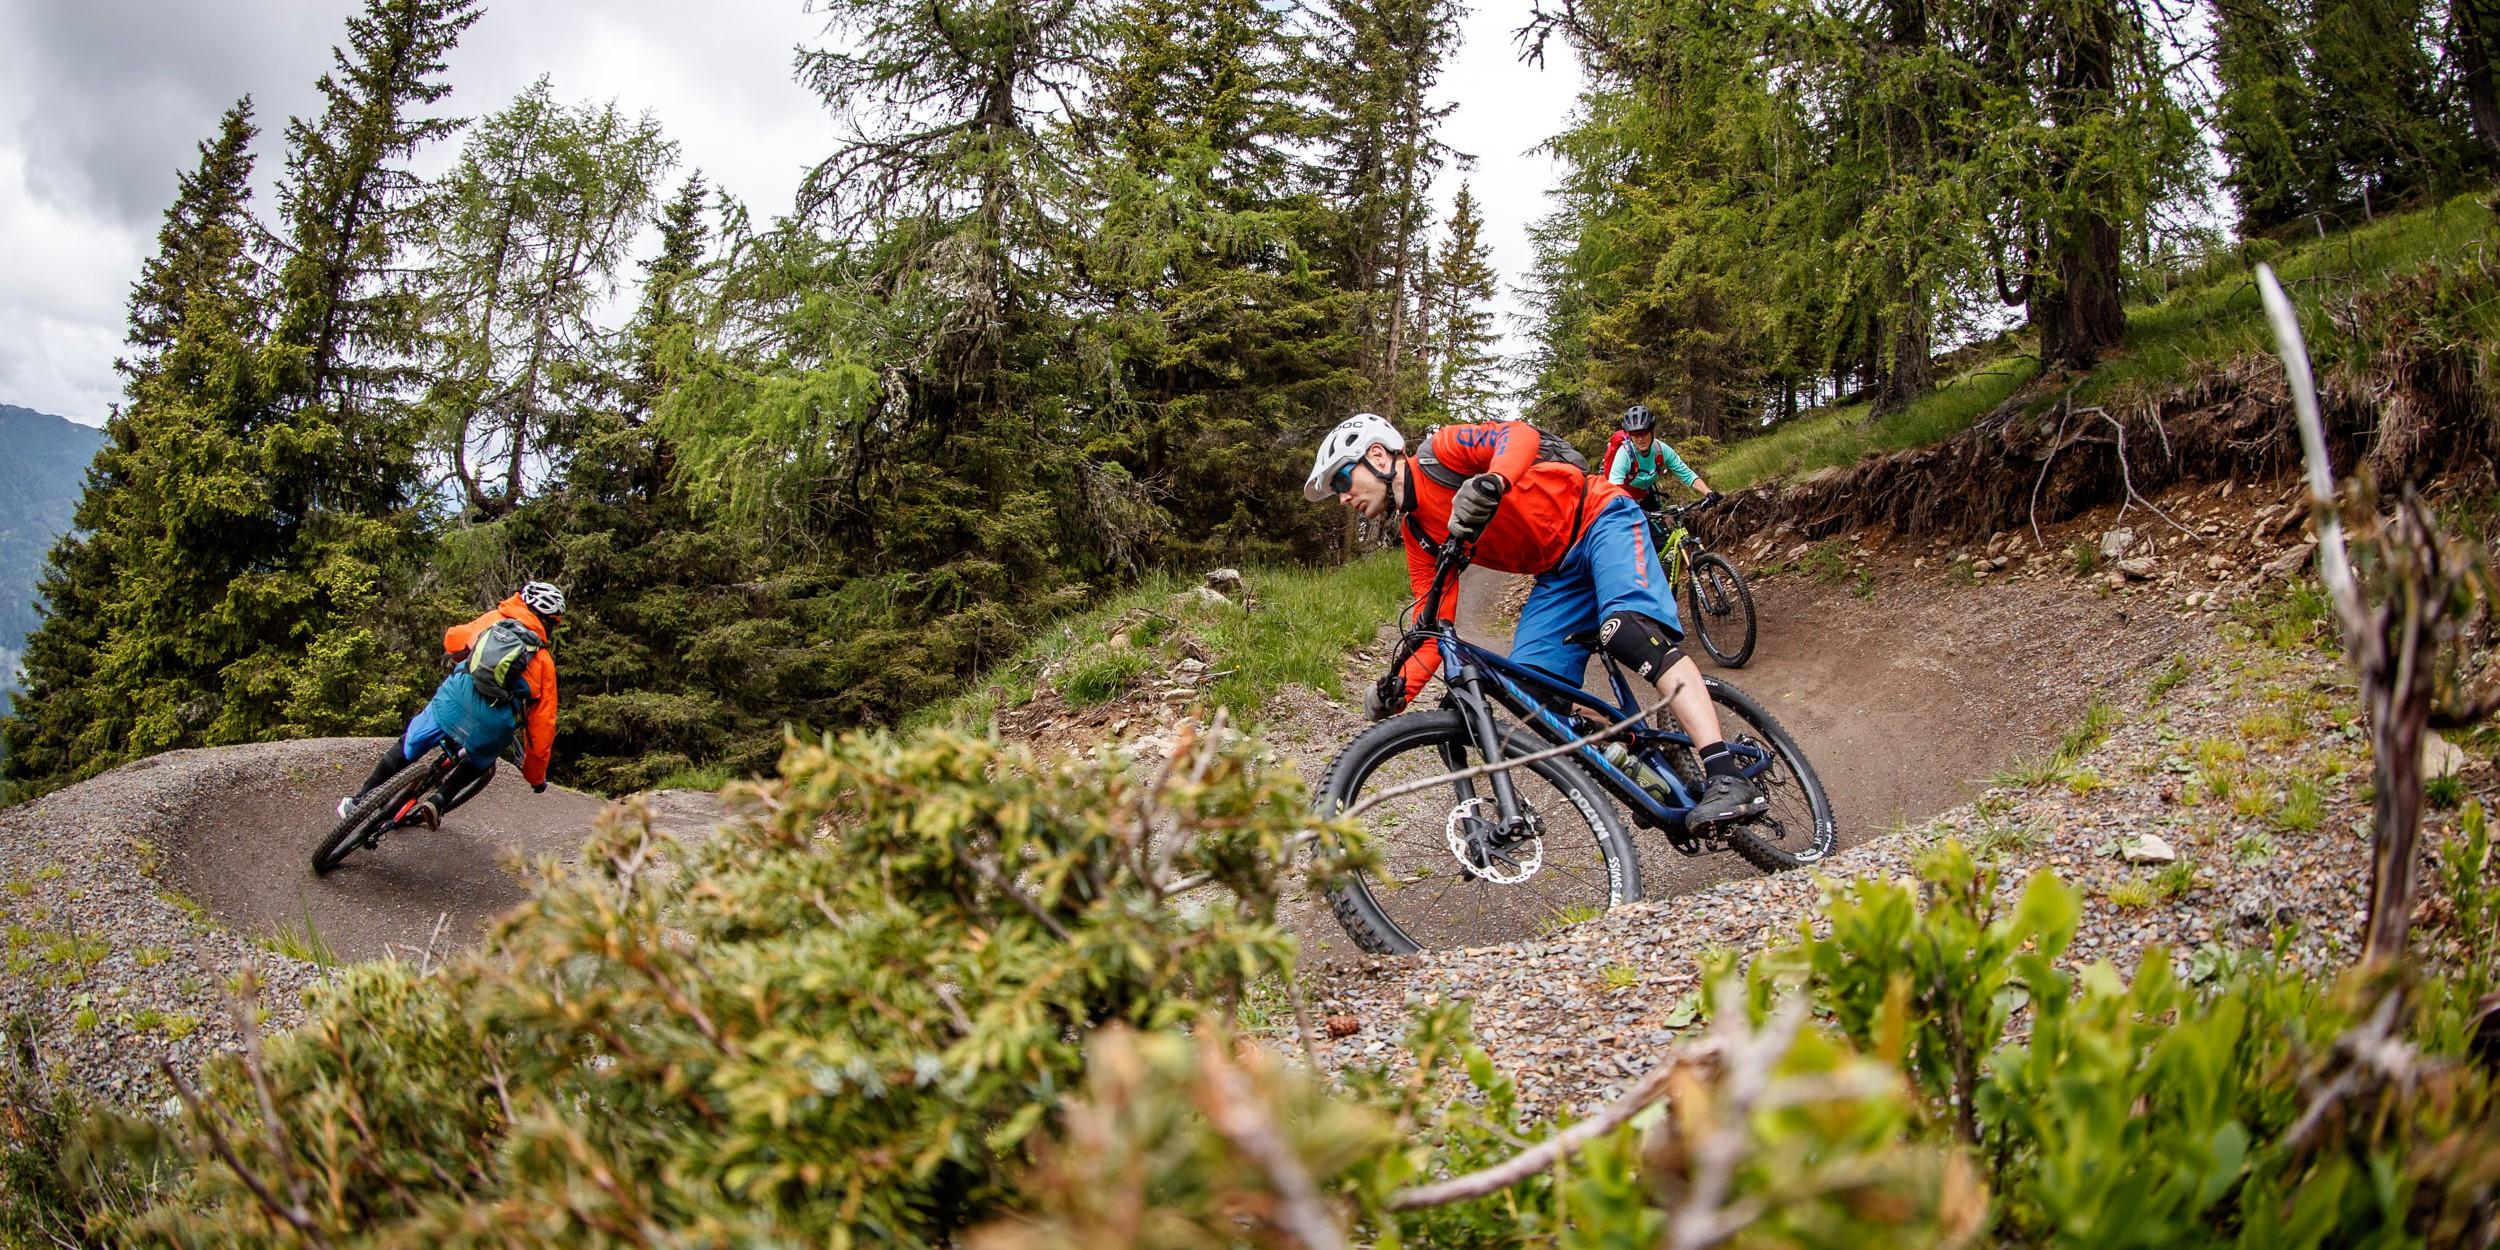 Nockbiken, Trails liken